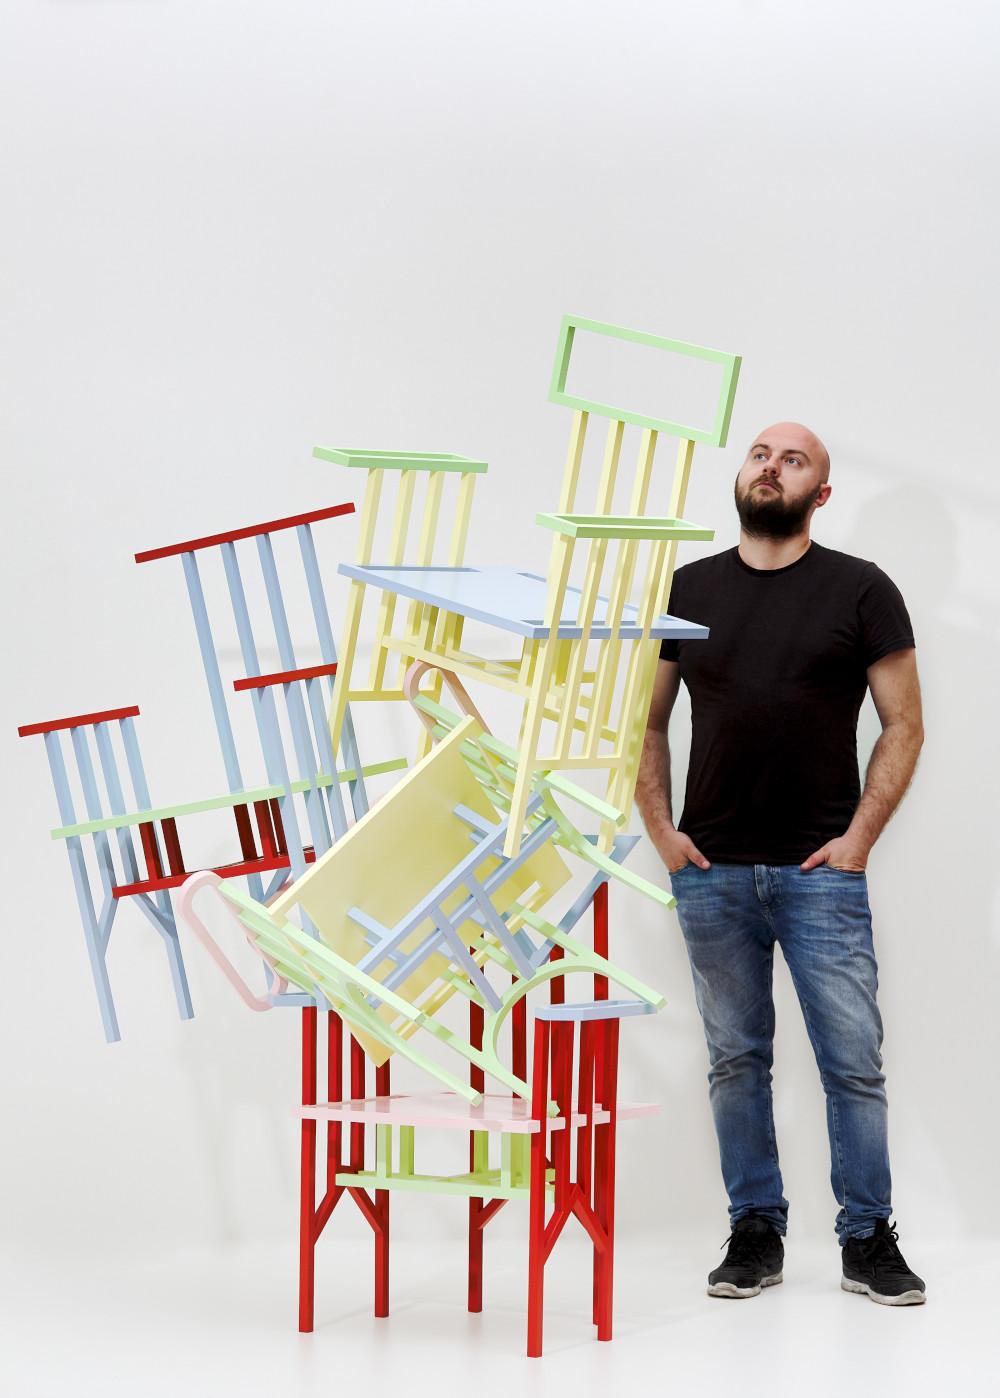 Abstract Chair par Egor Bondarenko